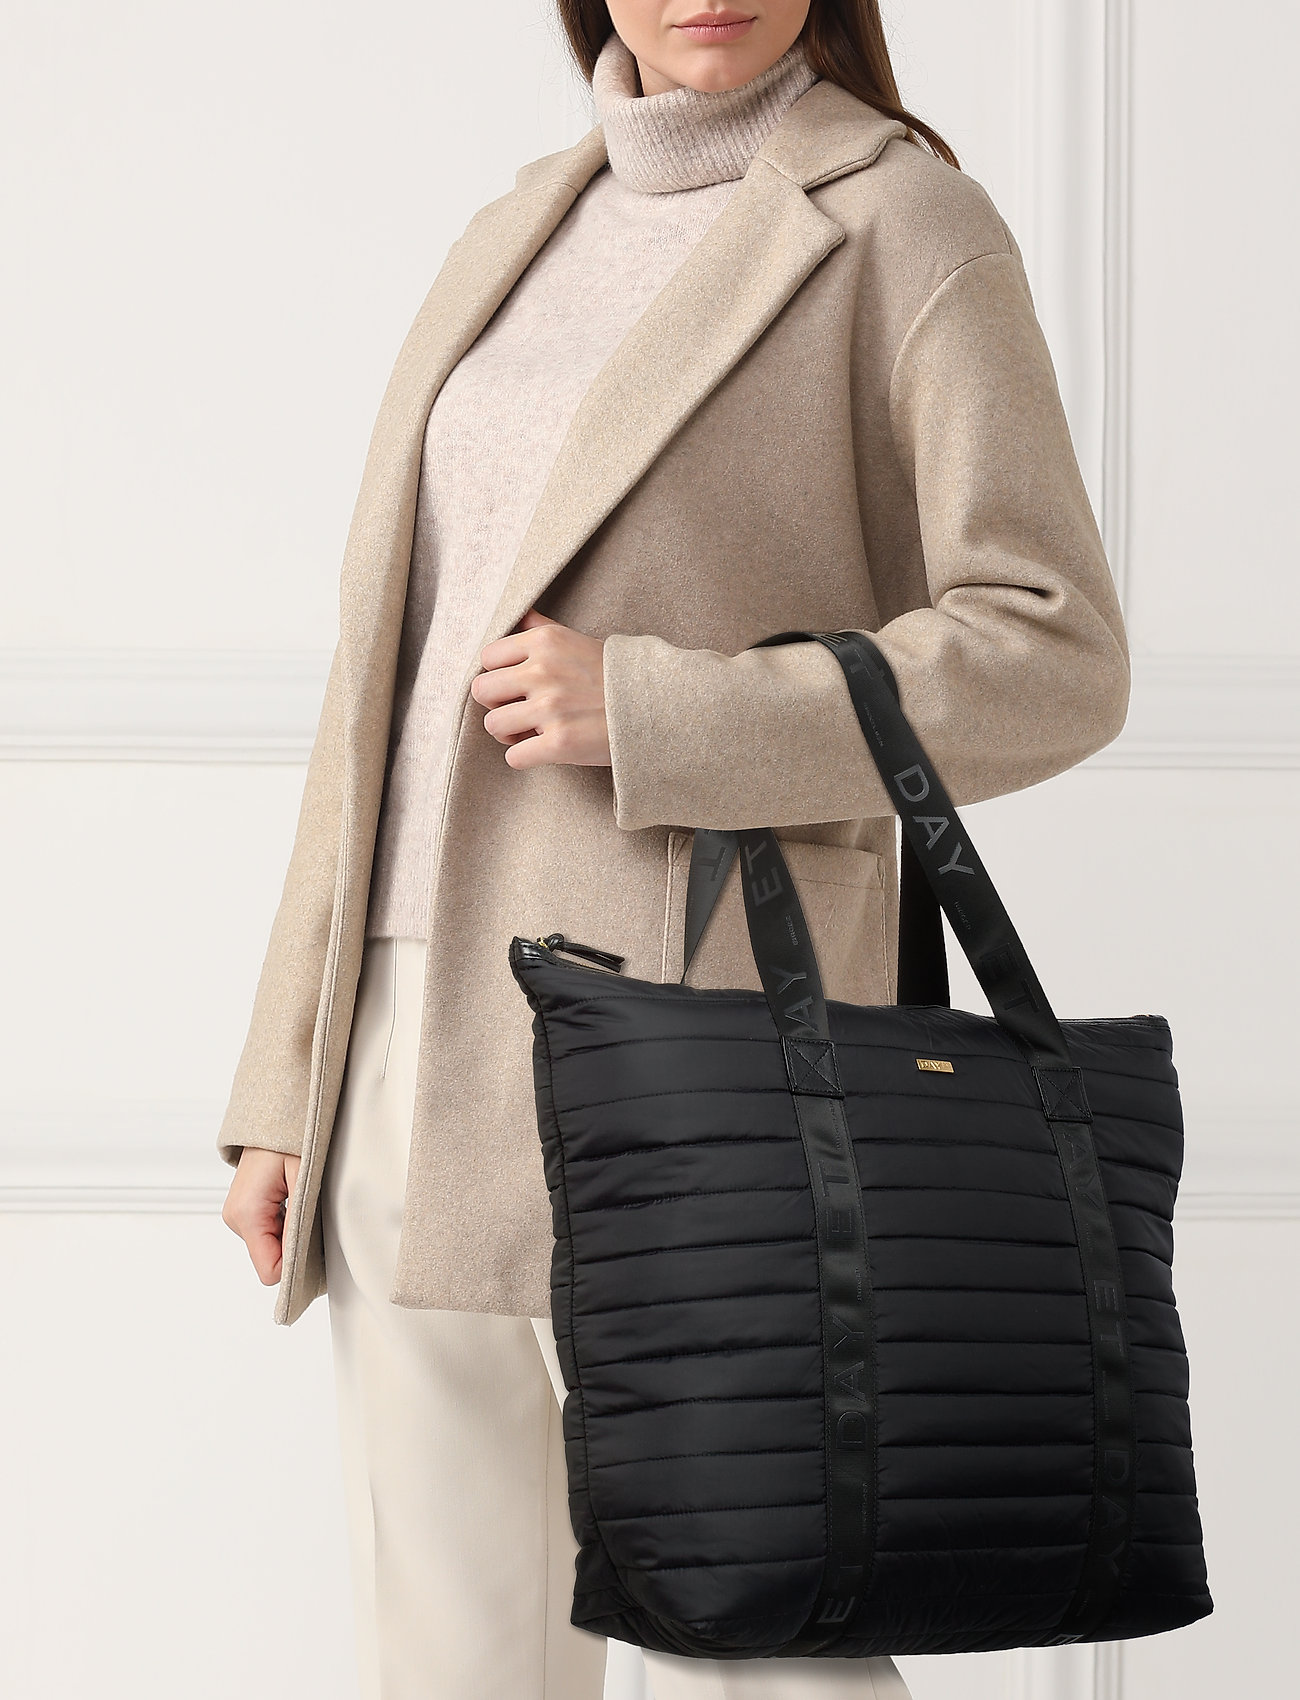 DAY et Day GW Puffer Bag - BLACK